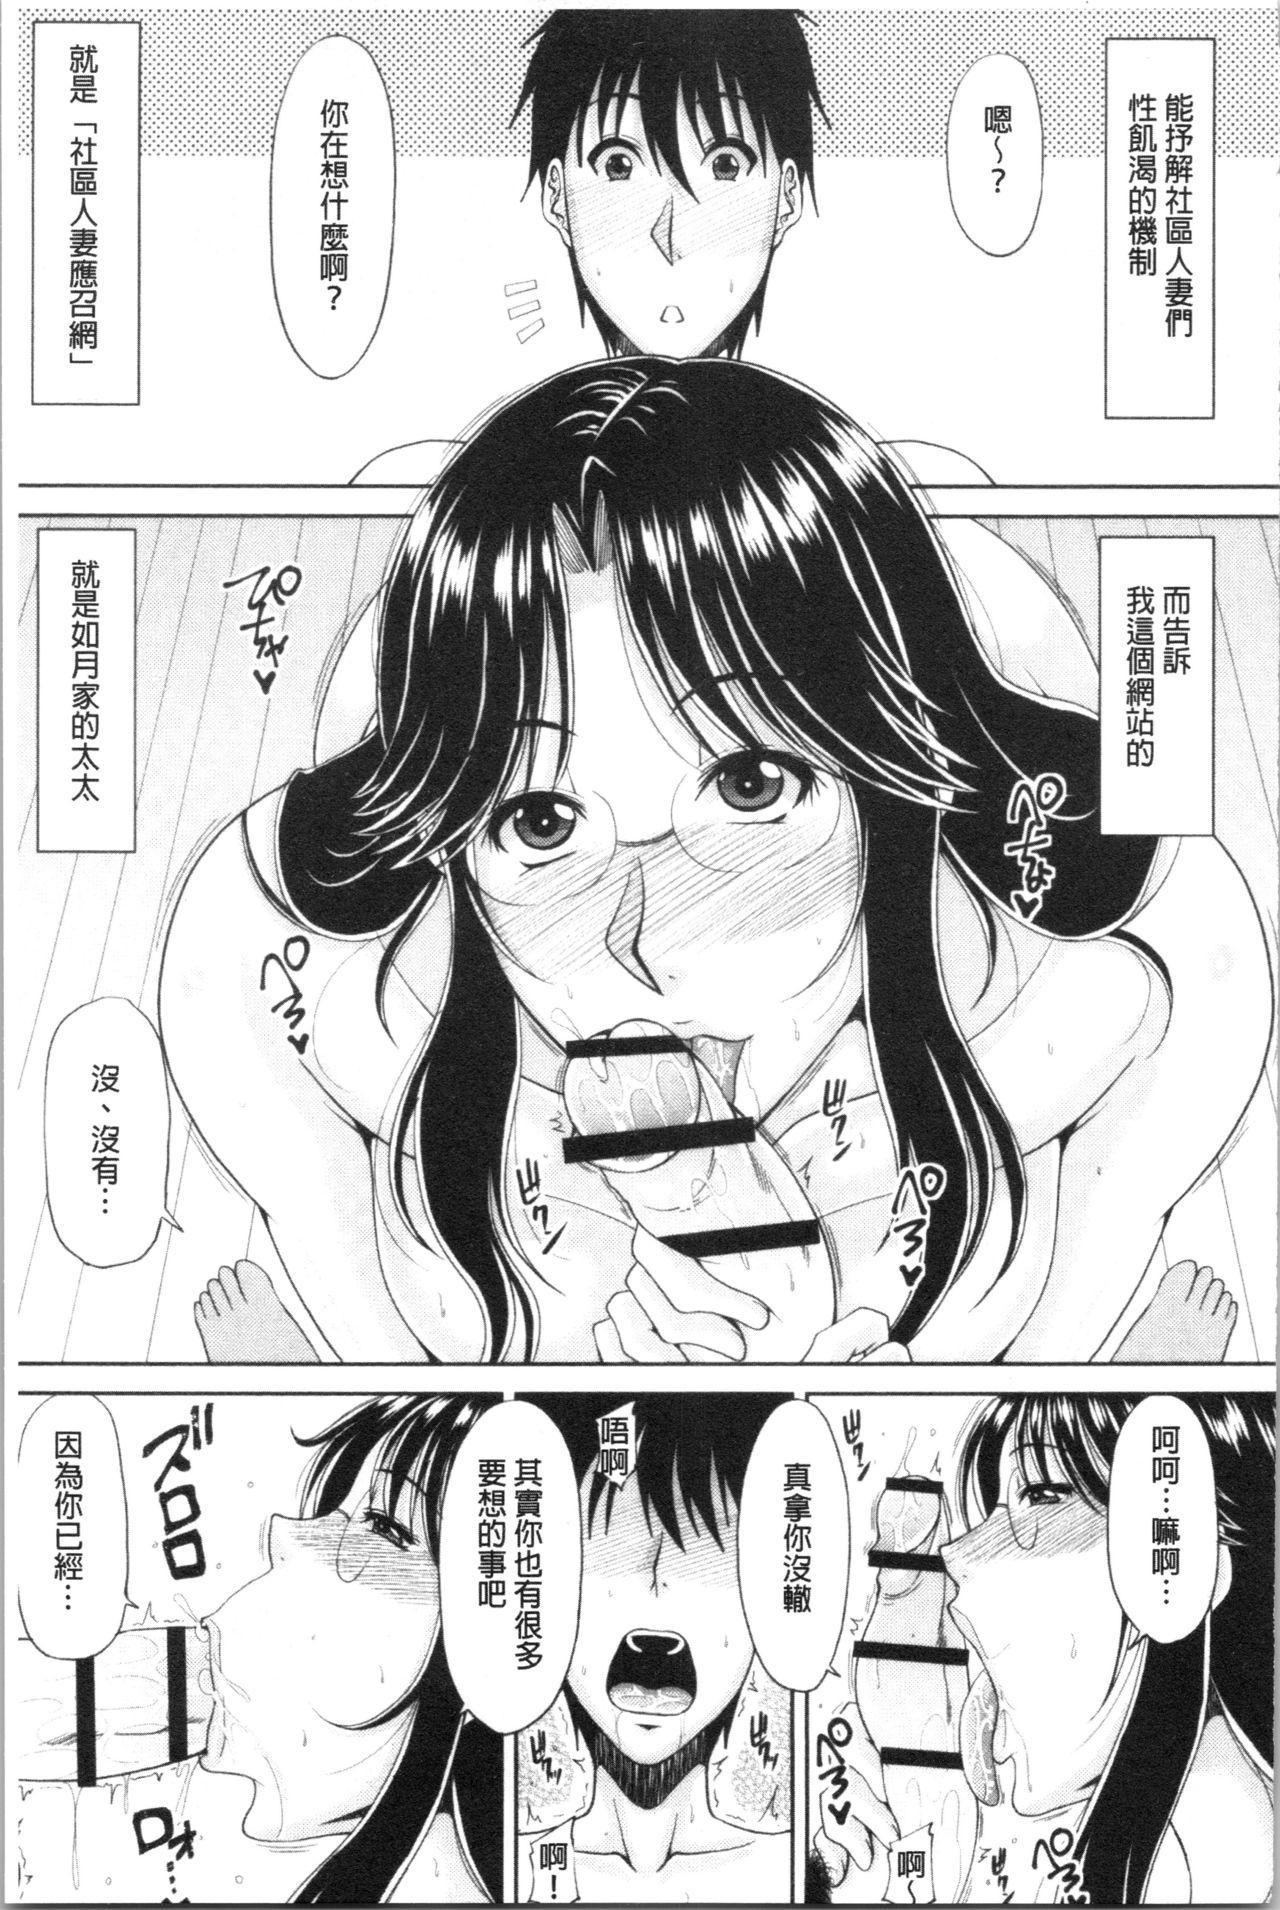 Haramase! 117